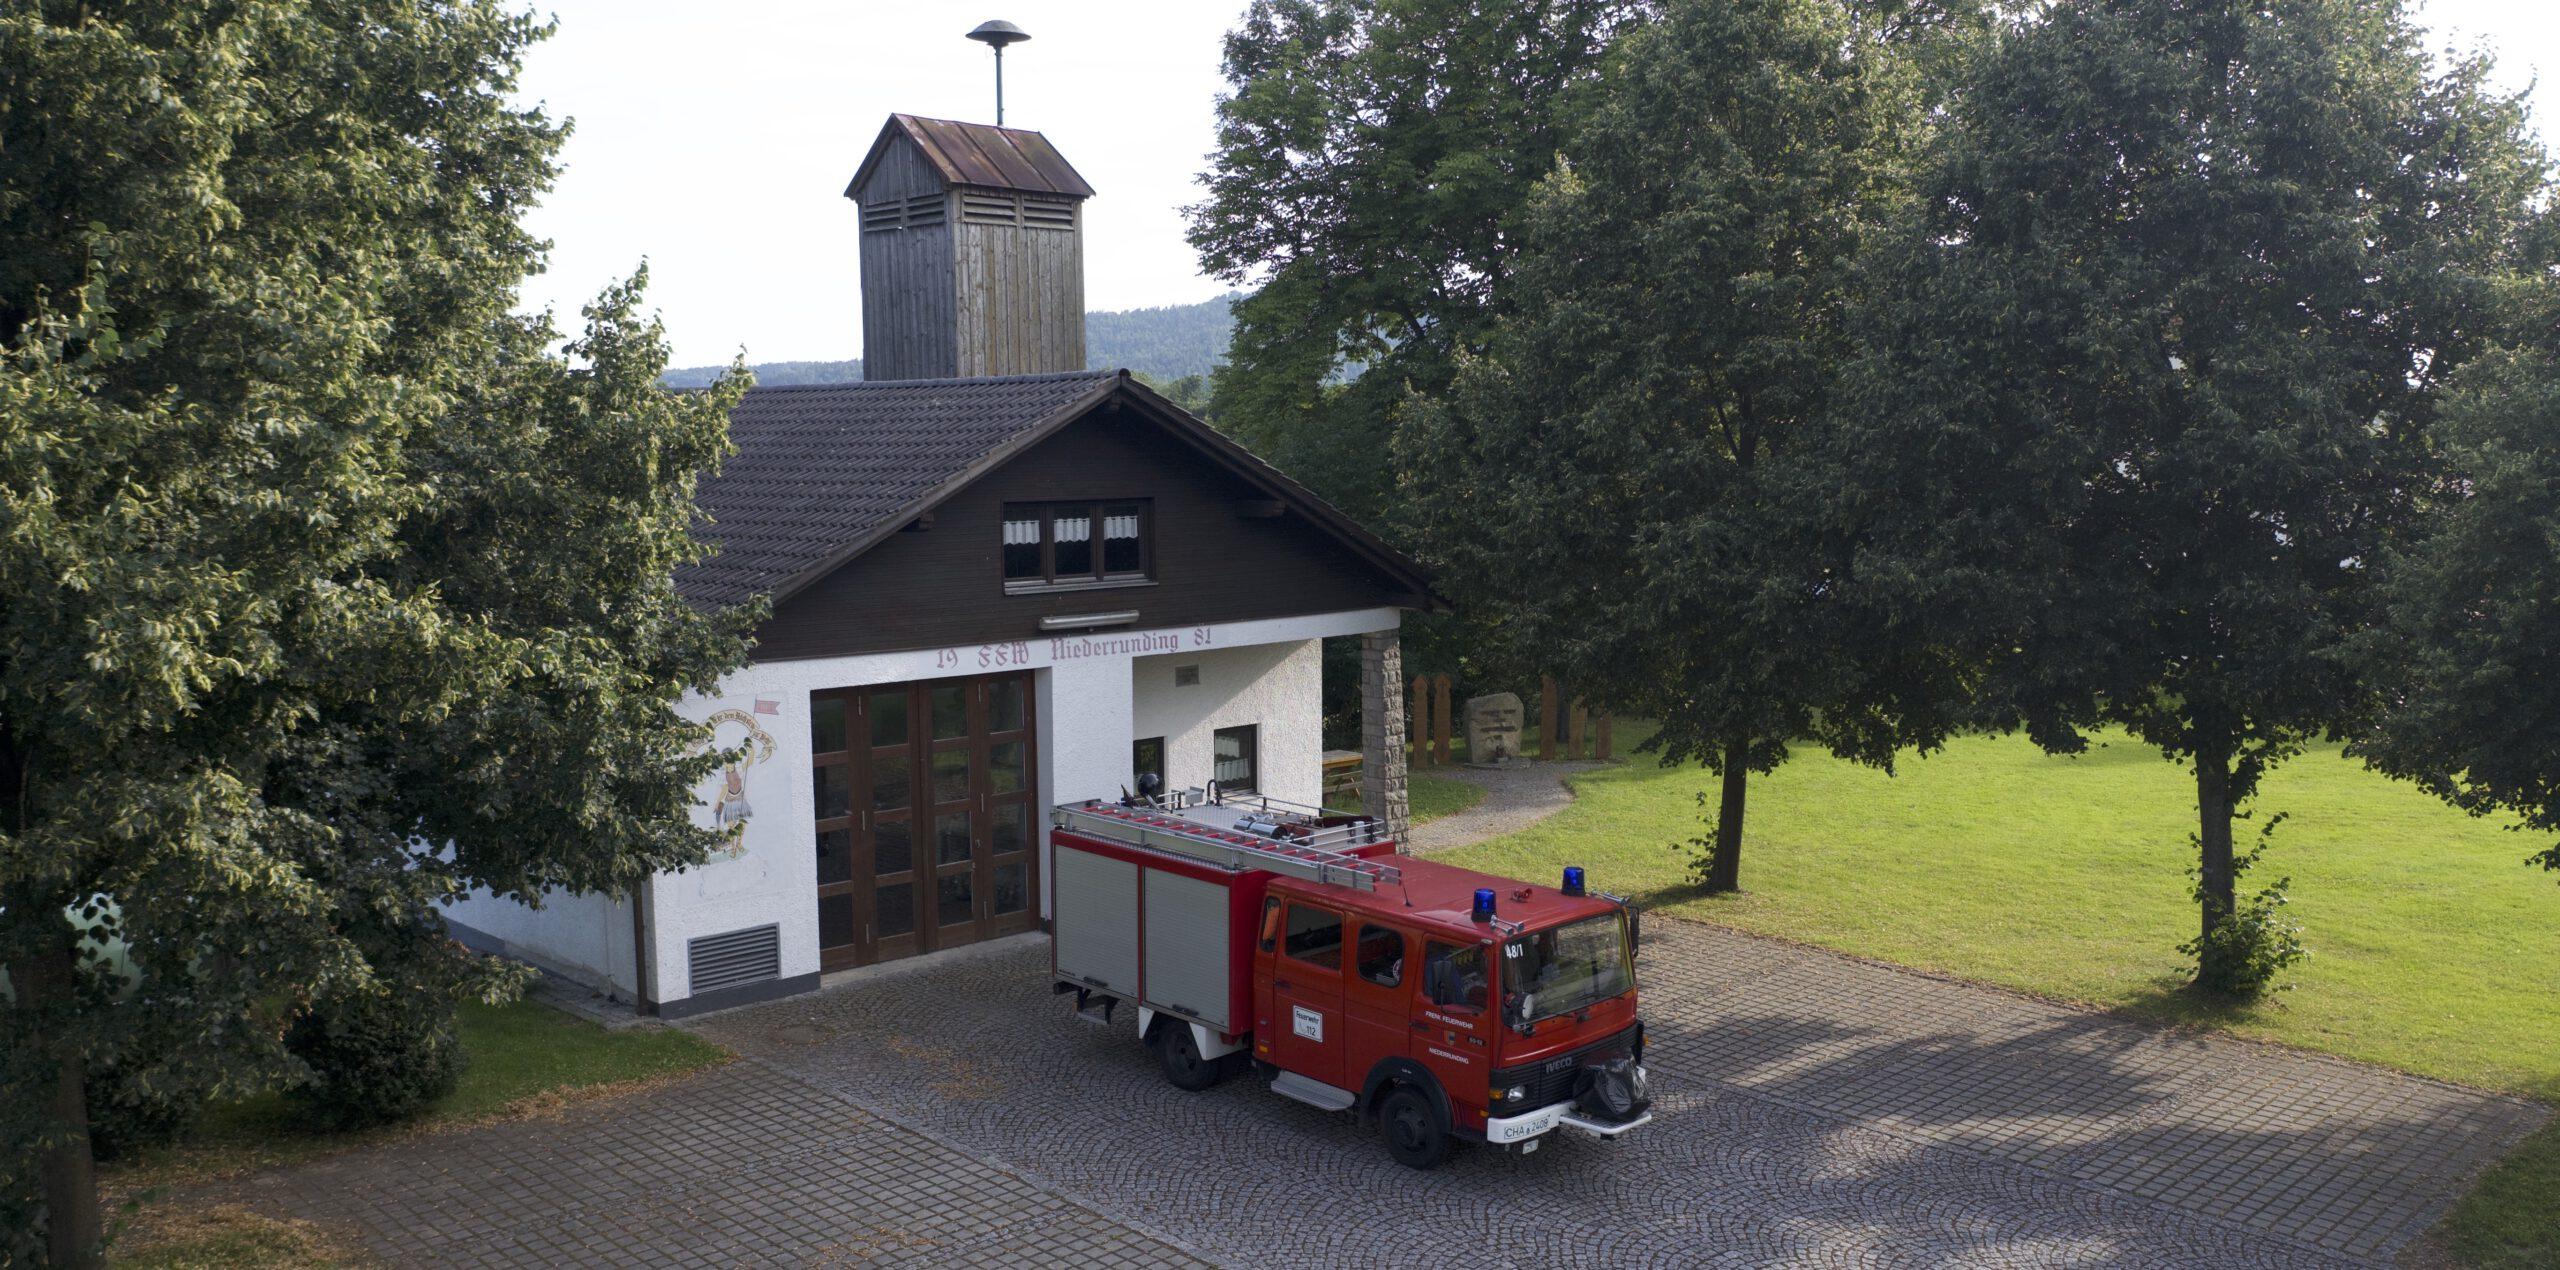 Freiwillige Feuerwehr Niederrunding e. V.